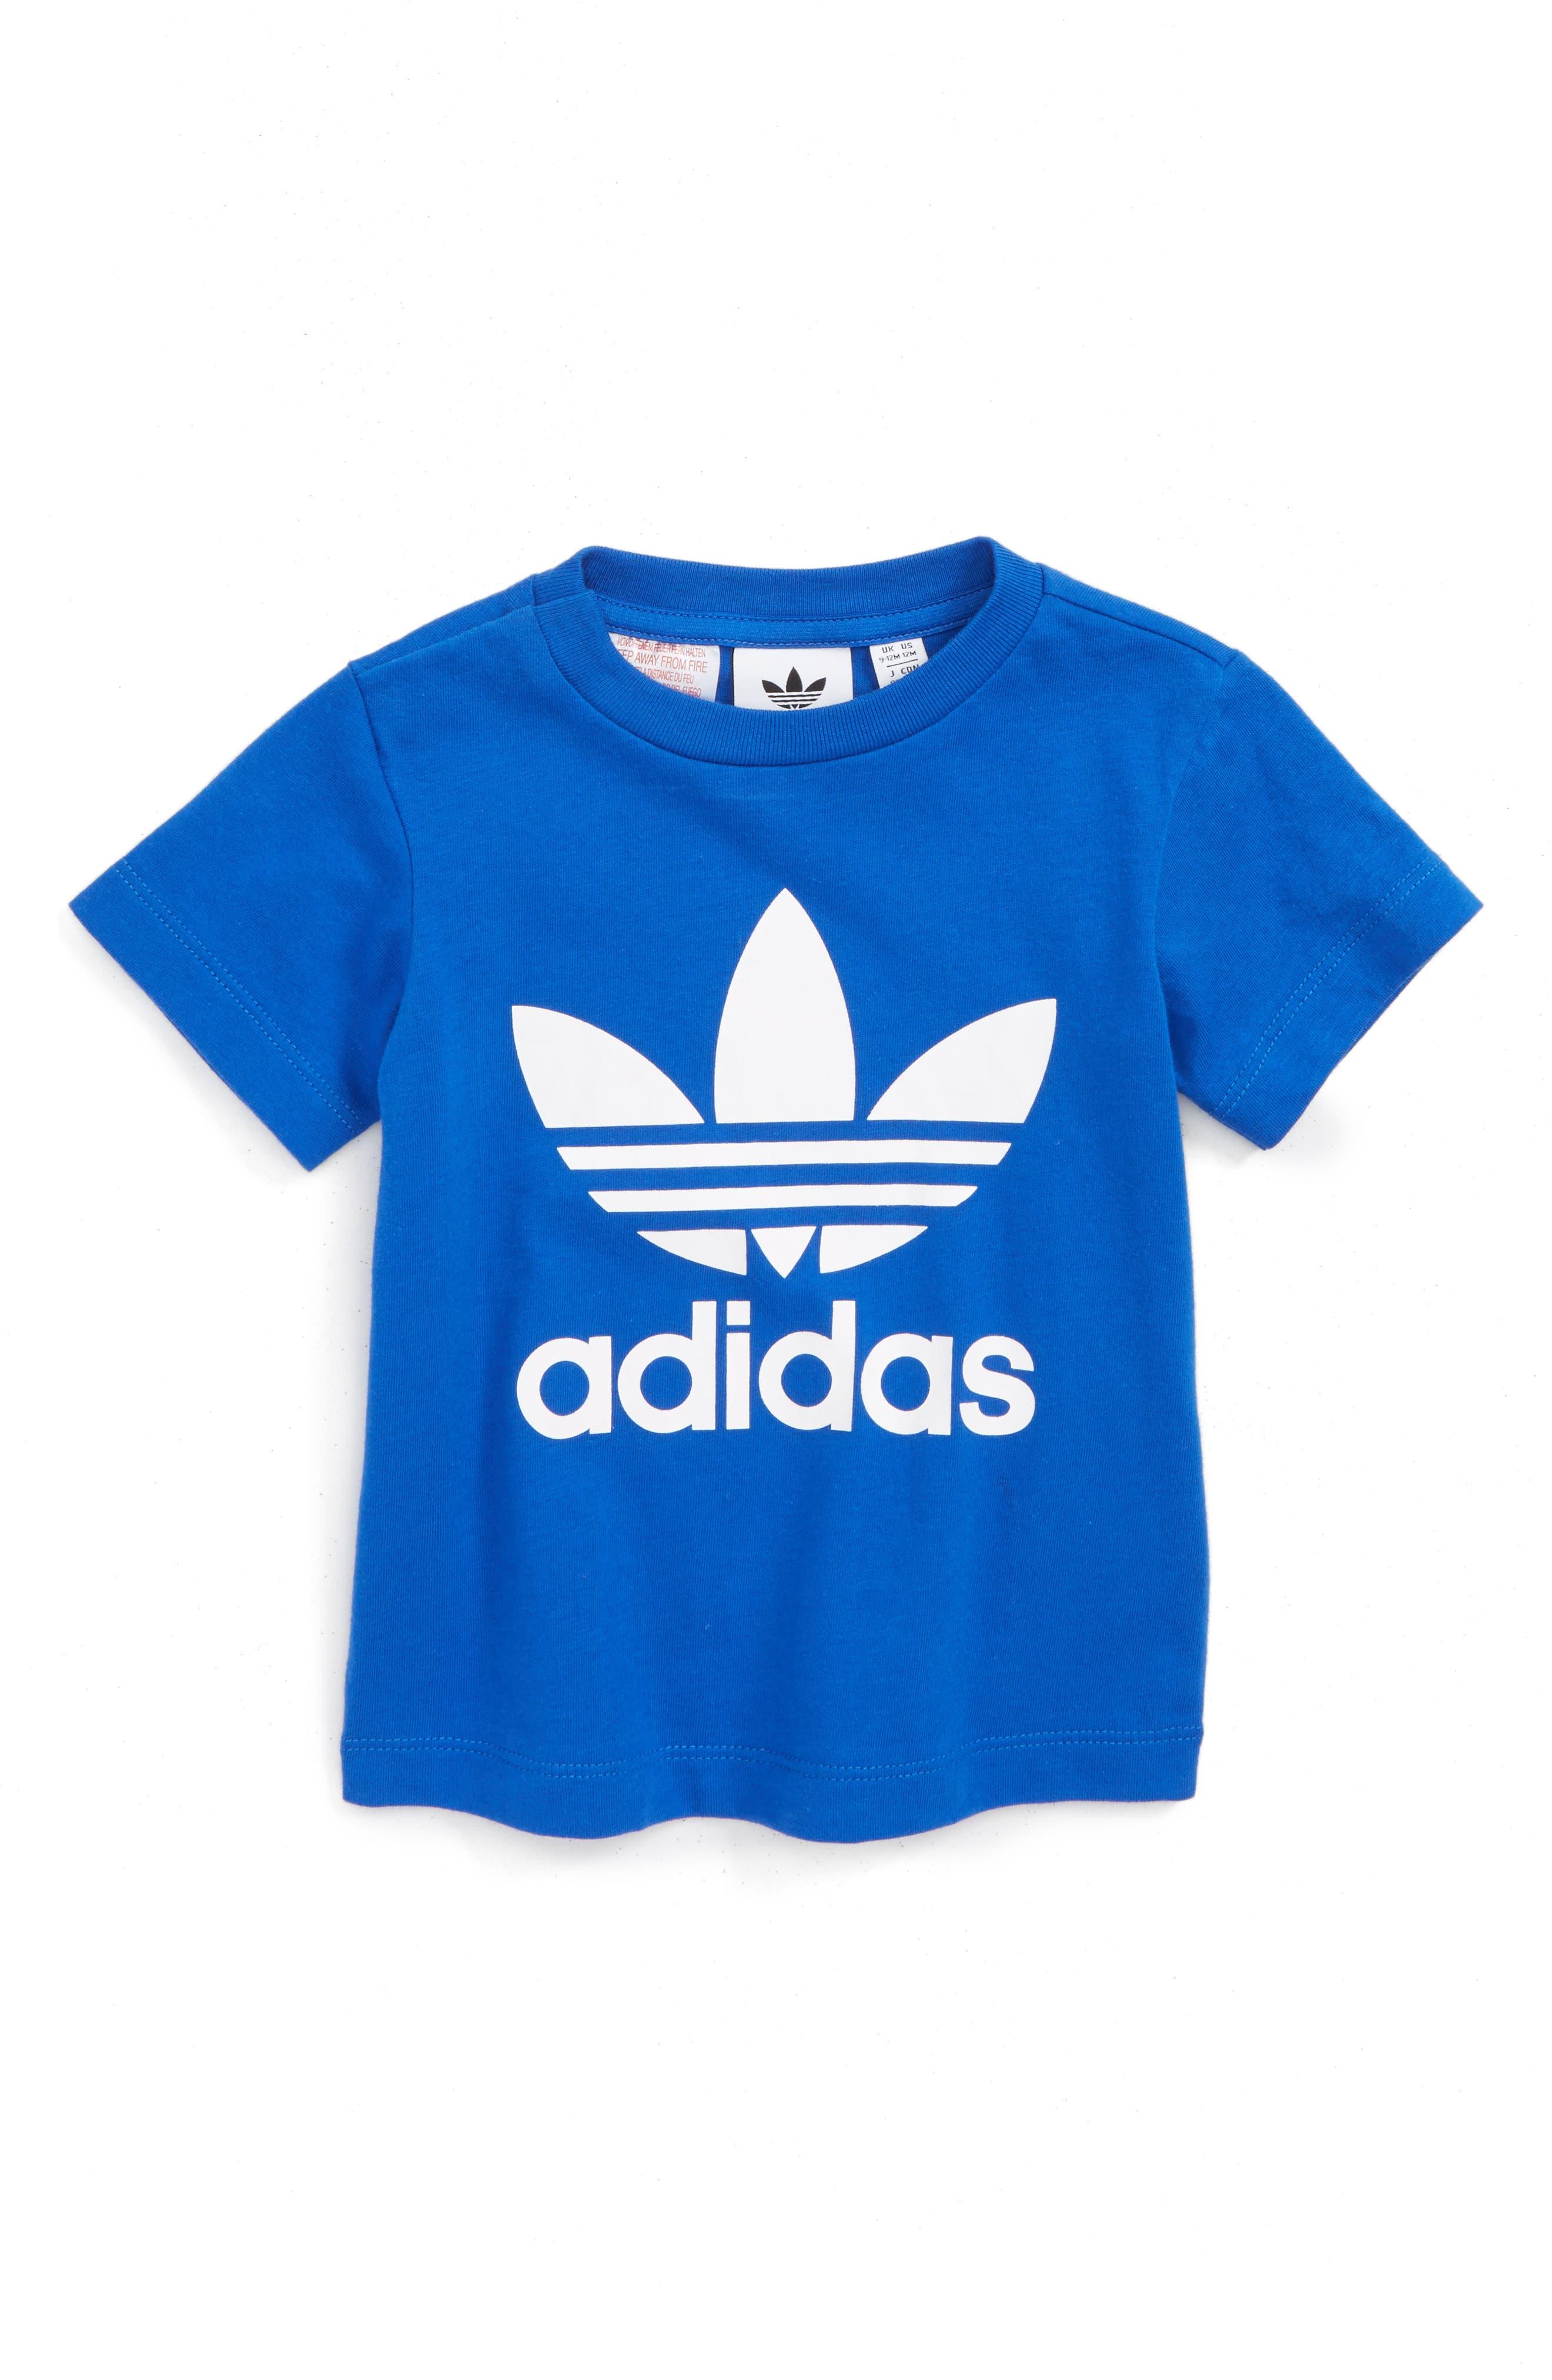 Originals Trefoil Logo T-Shirt,                             Main thumbnail 1, color,                             Blue. White